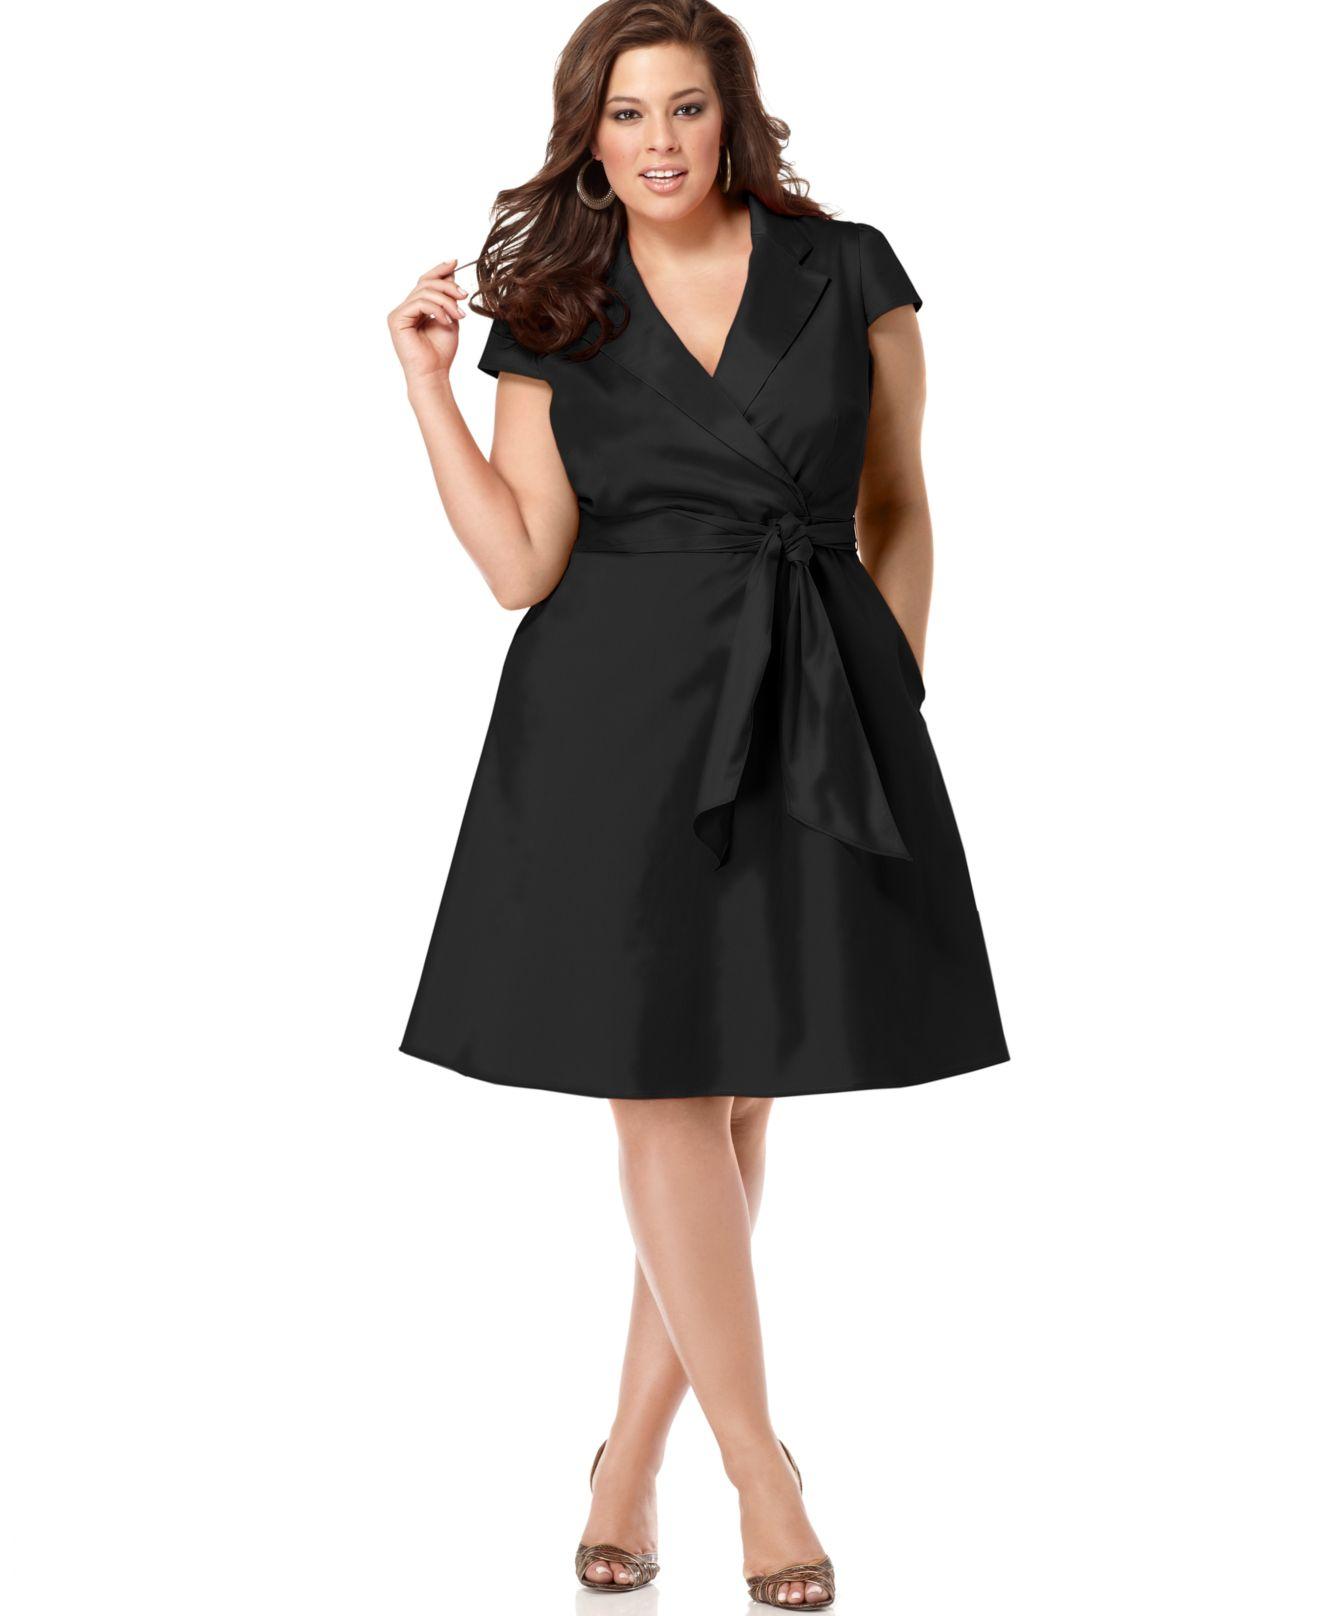 09ef2badb031 Spense Plus Size Short-sleeve Wrap Dress in Black - Lyst